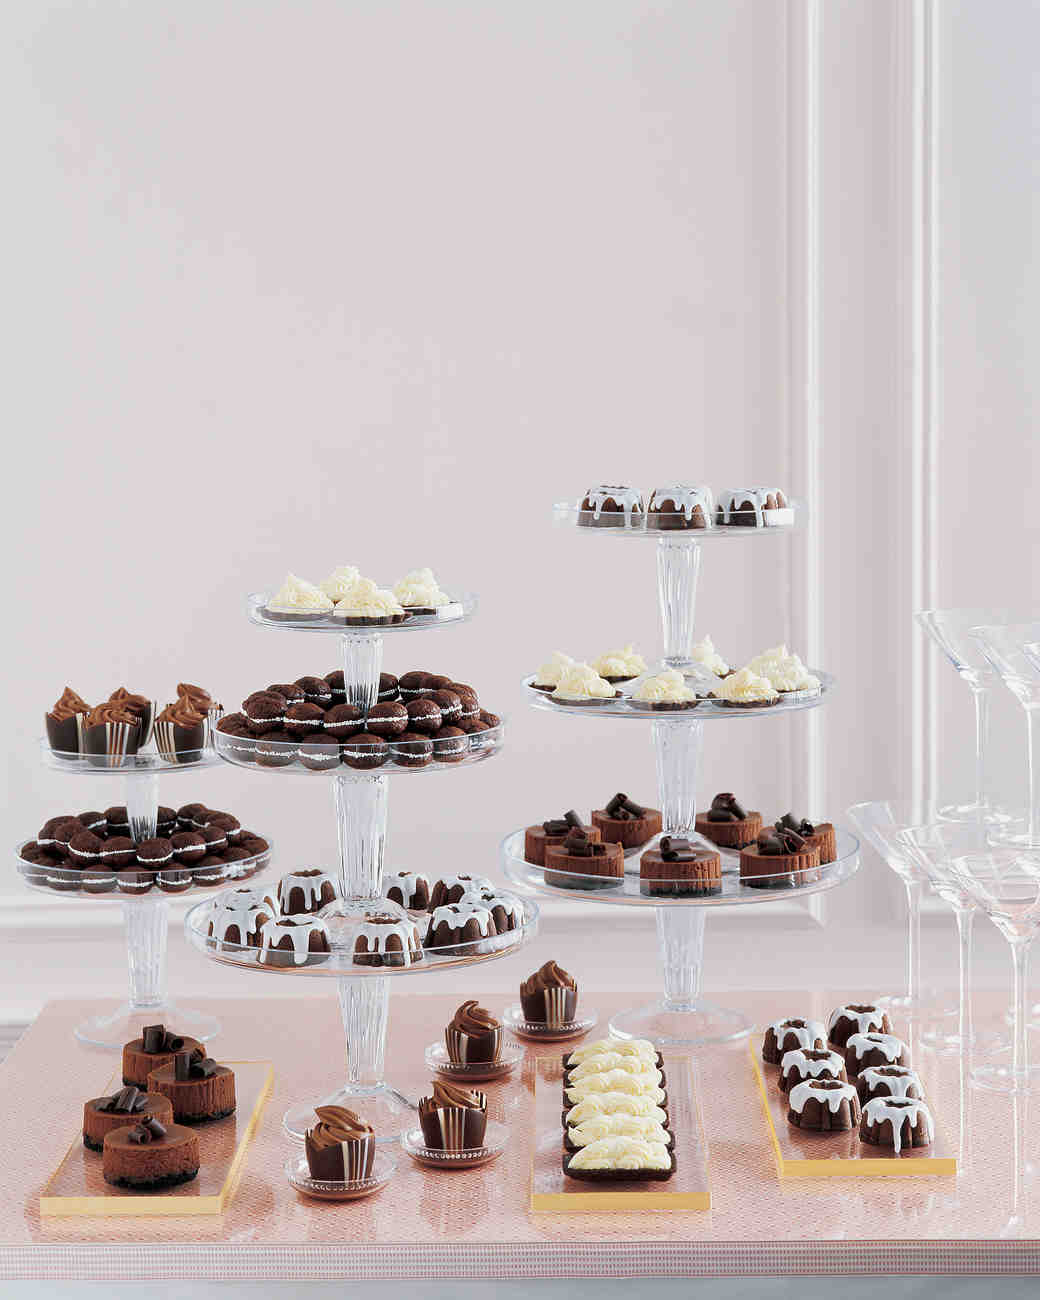 dessert-bar-fall05-mwa101634.jpg